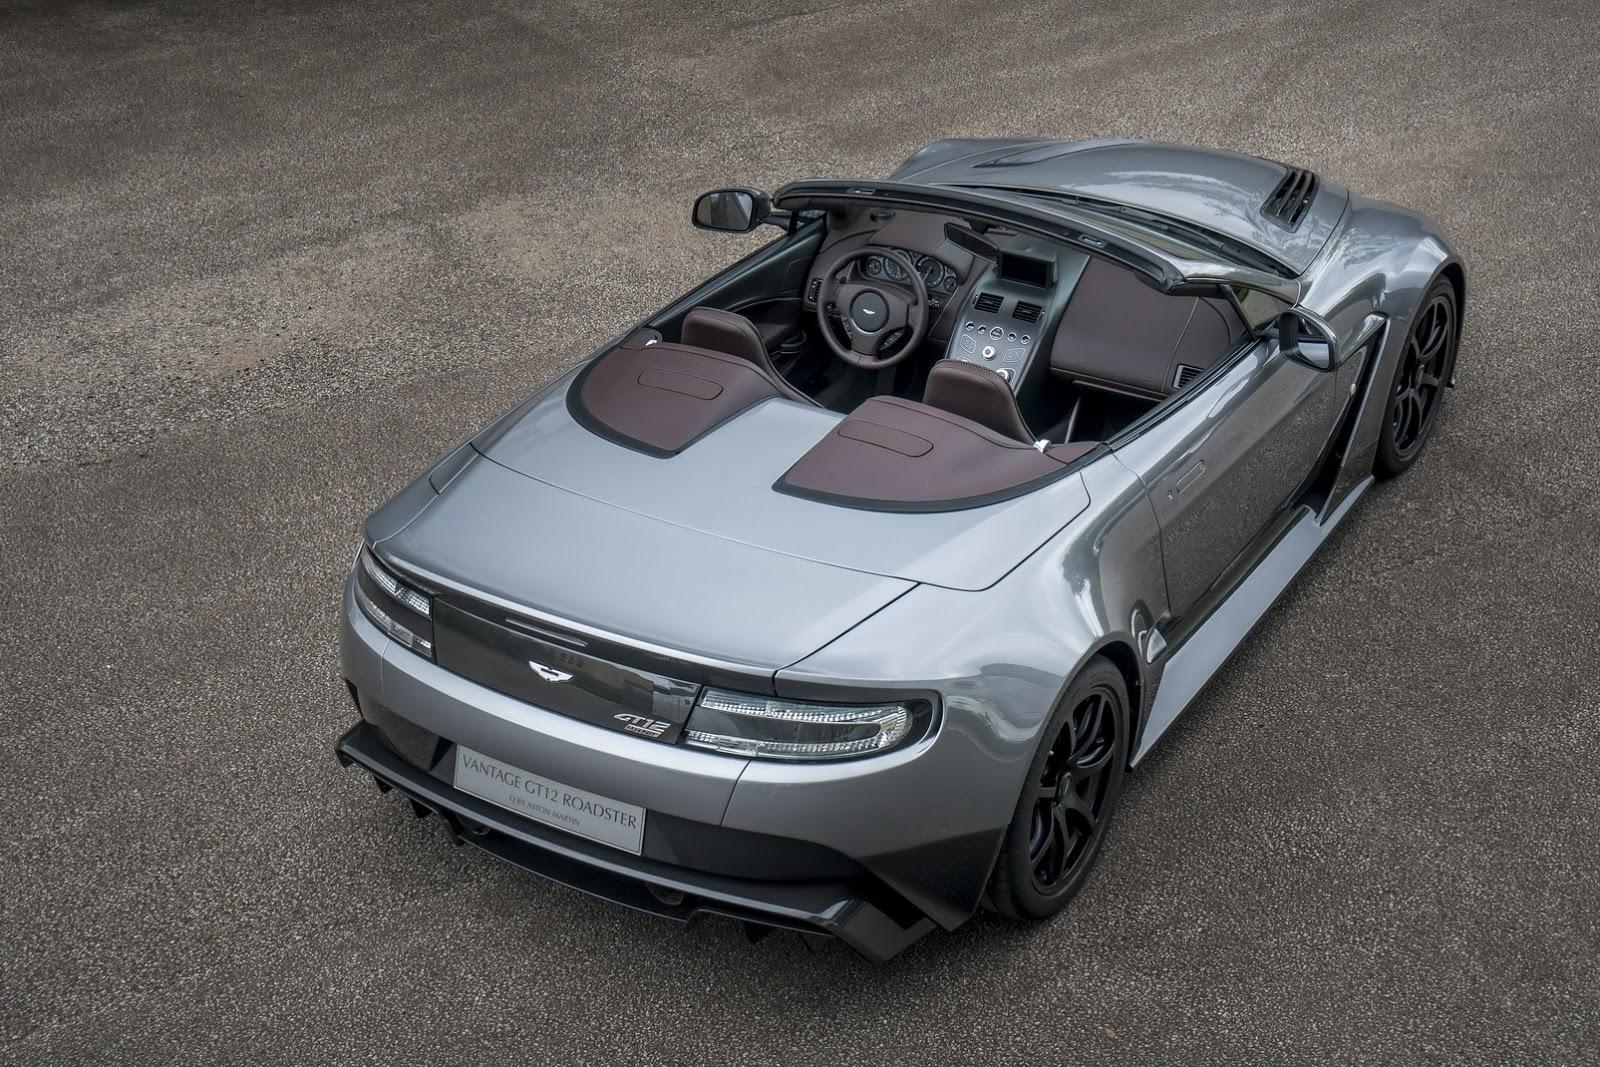 Aston Martin Vantage Gt12 Roadster 17